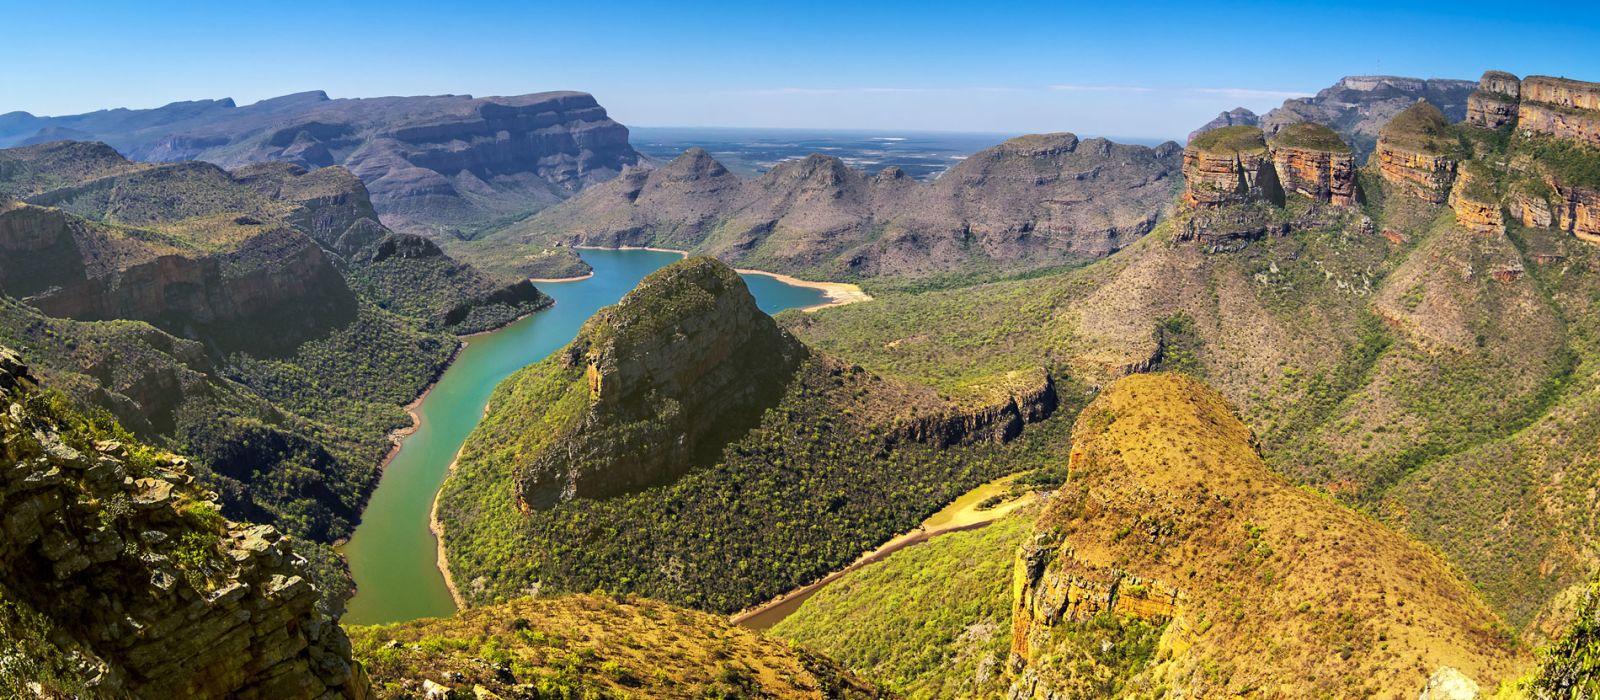 Sambia und Südafrika: Panoramaroute, Safari und Viktoriafälle Urlaub 4